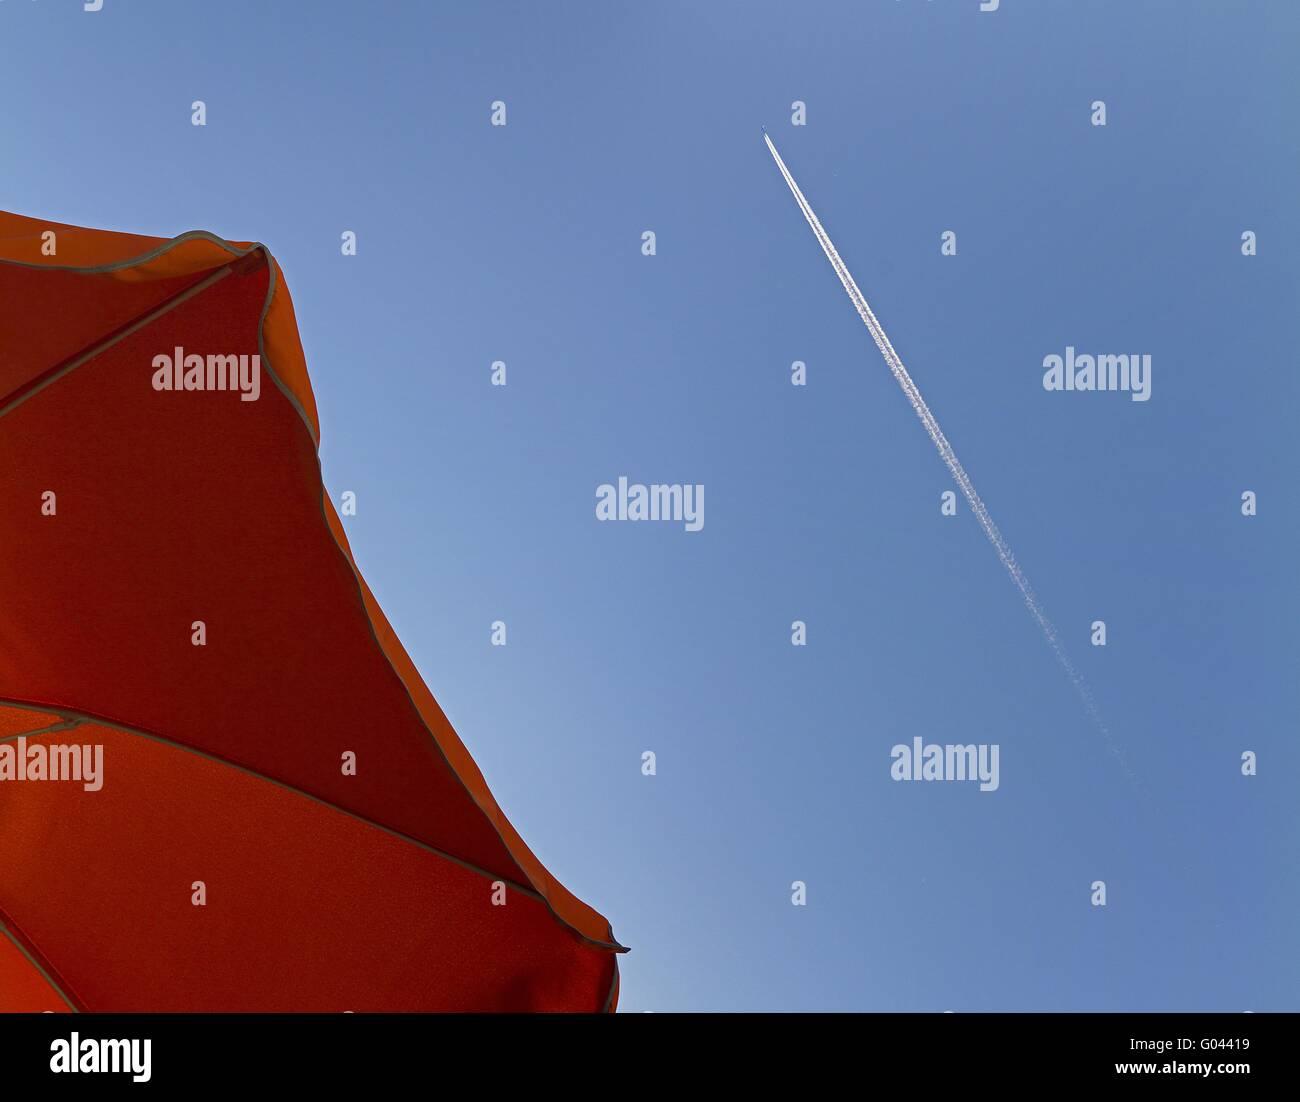 sunshade with airplane - Stock Image